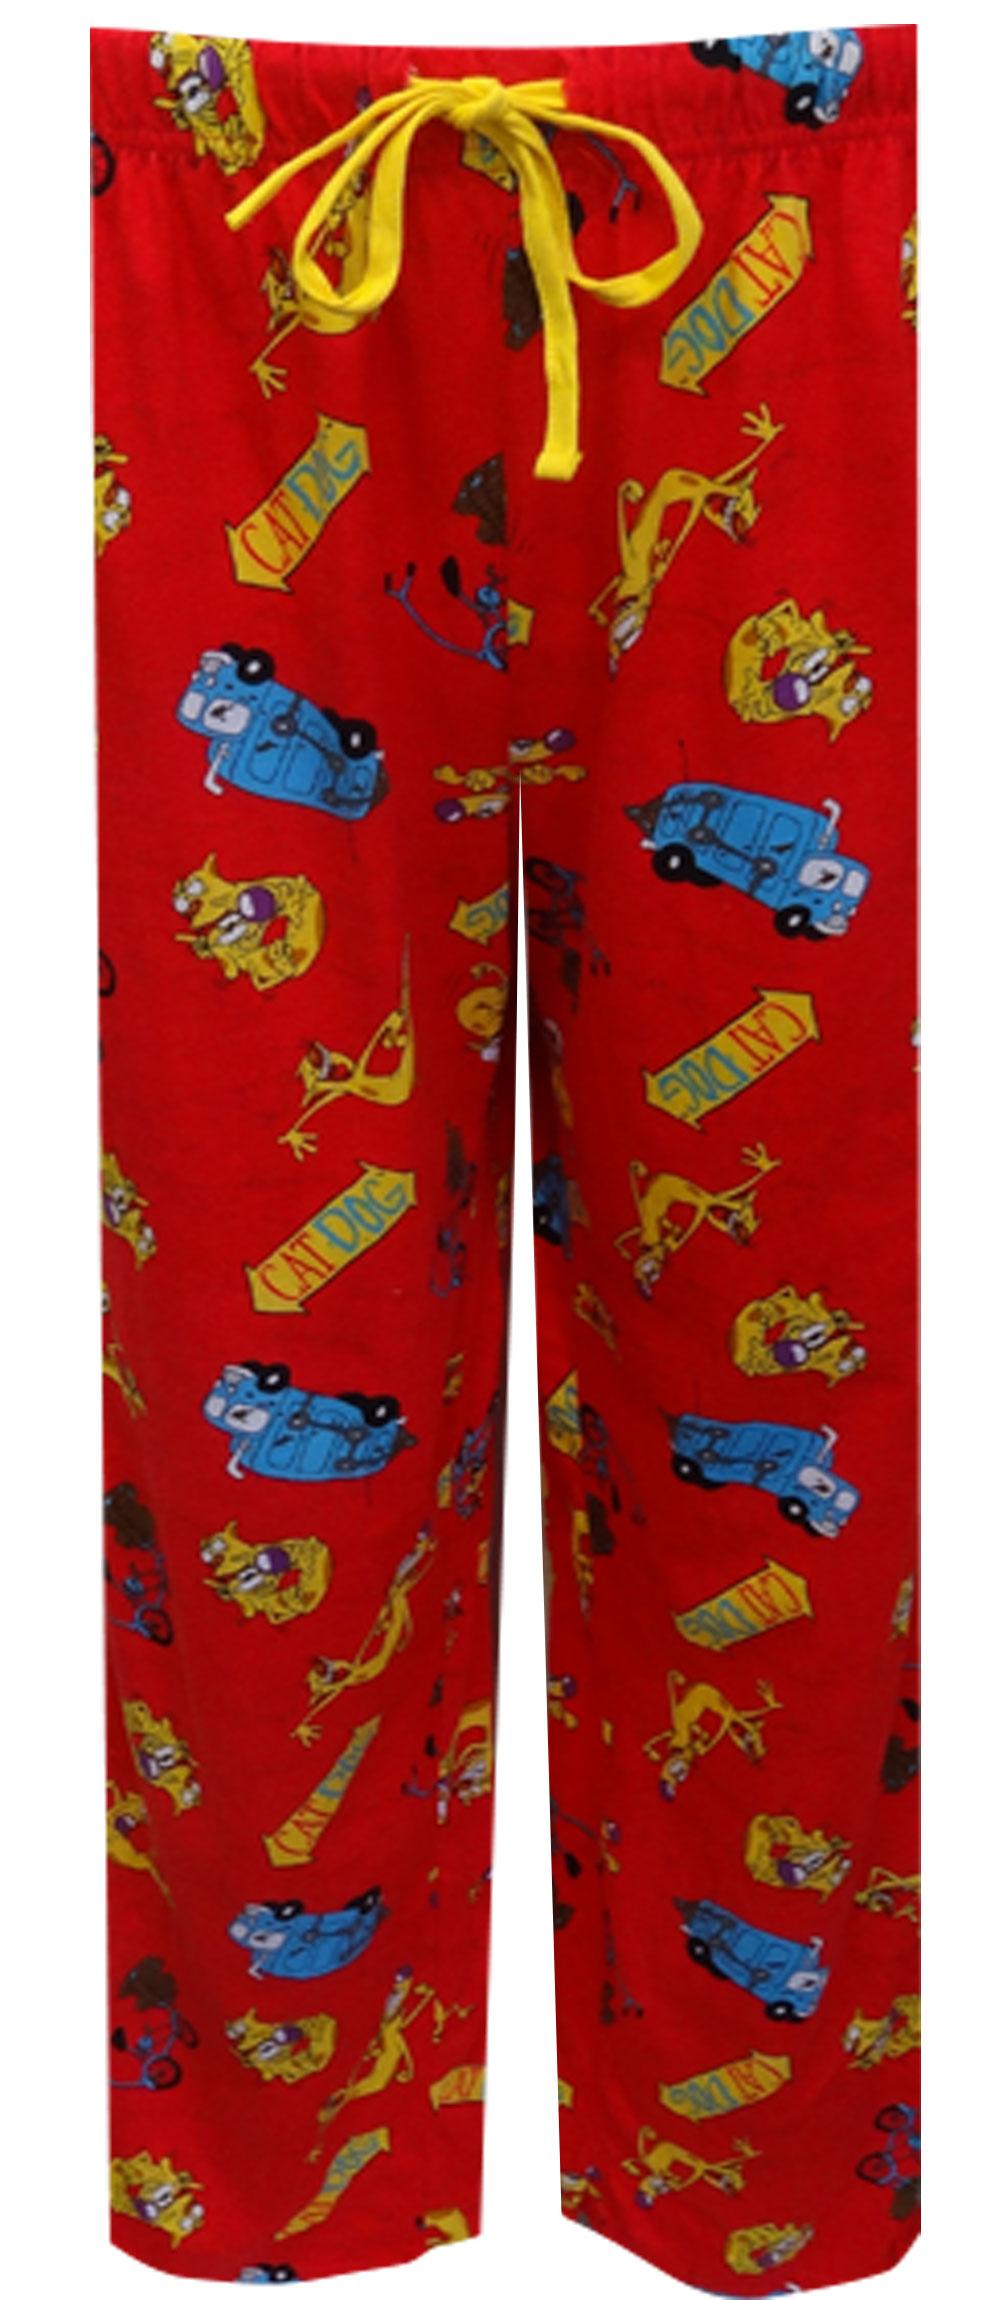 Nickelodeon Rewind CatDog Red Lounge Pants for men